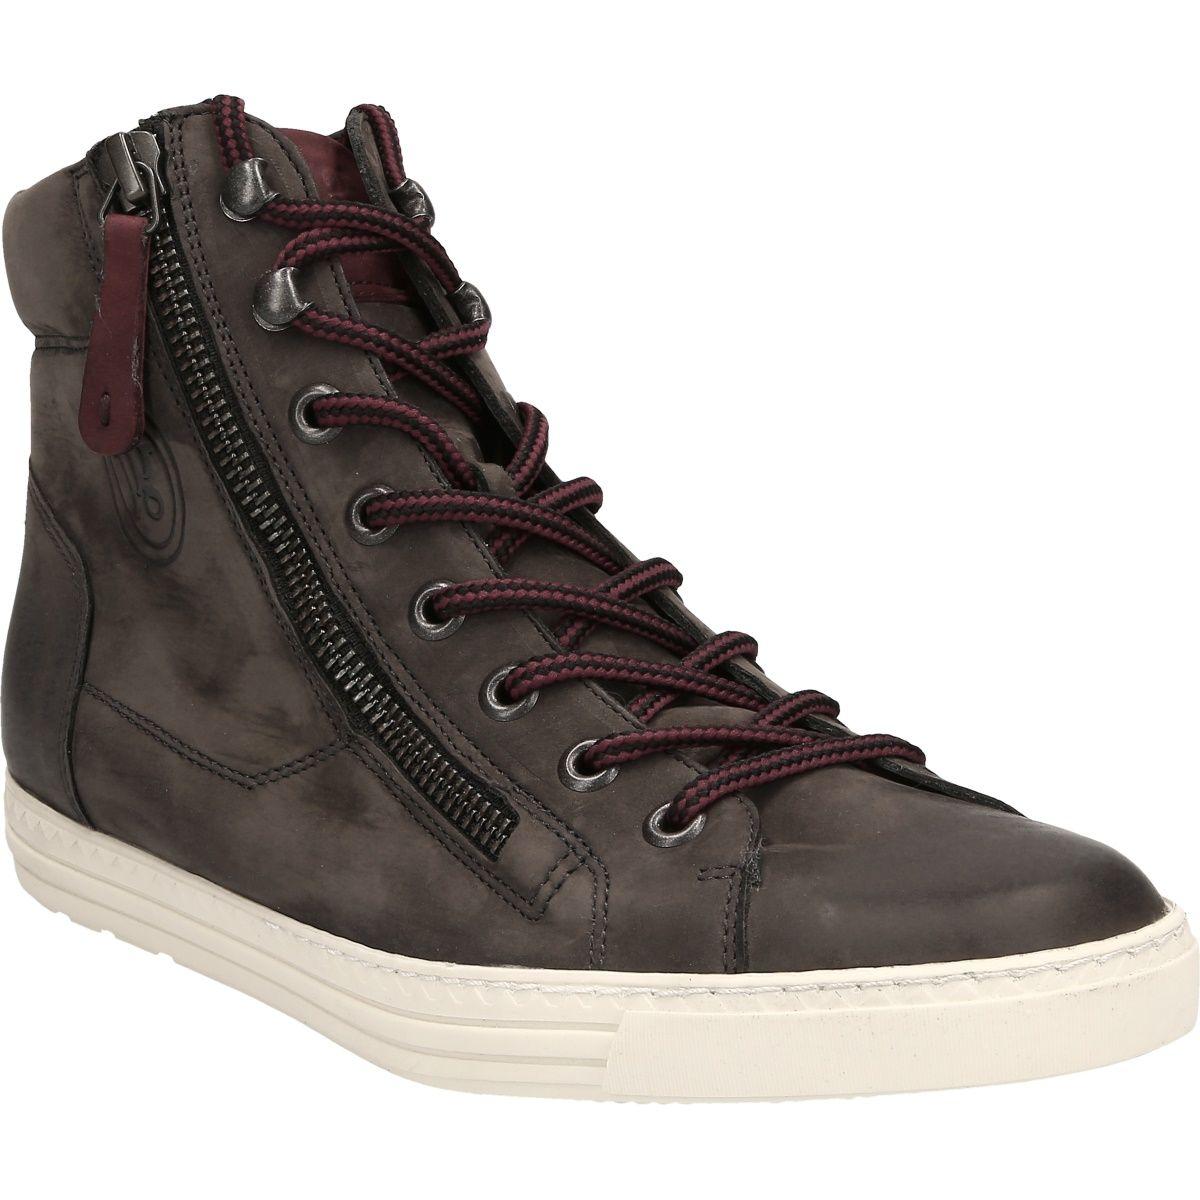 Paul Green Sneaker mit Perforation | Produktkatalog Fashion